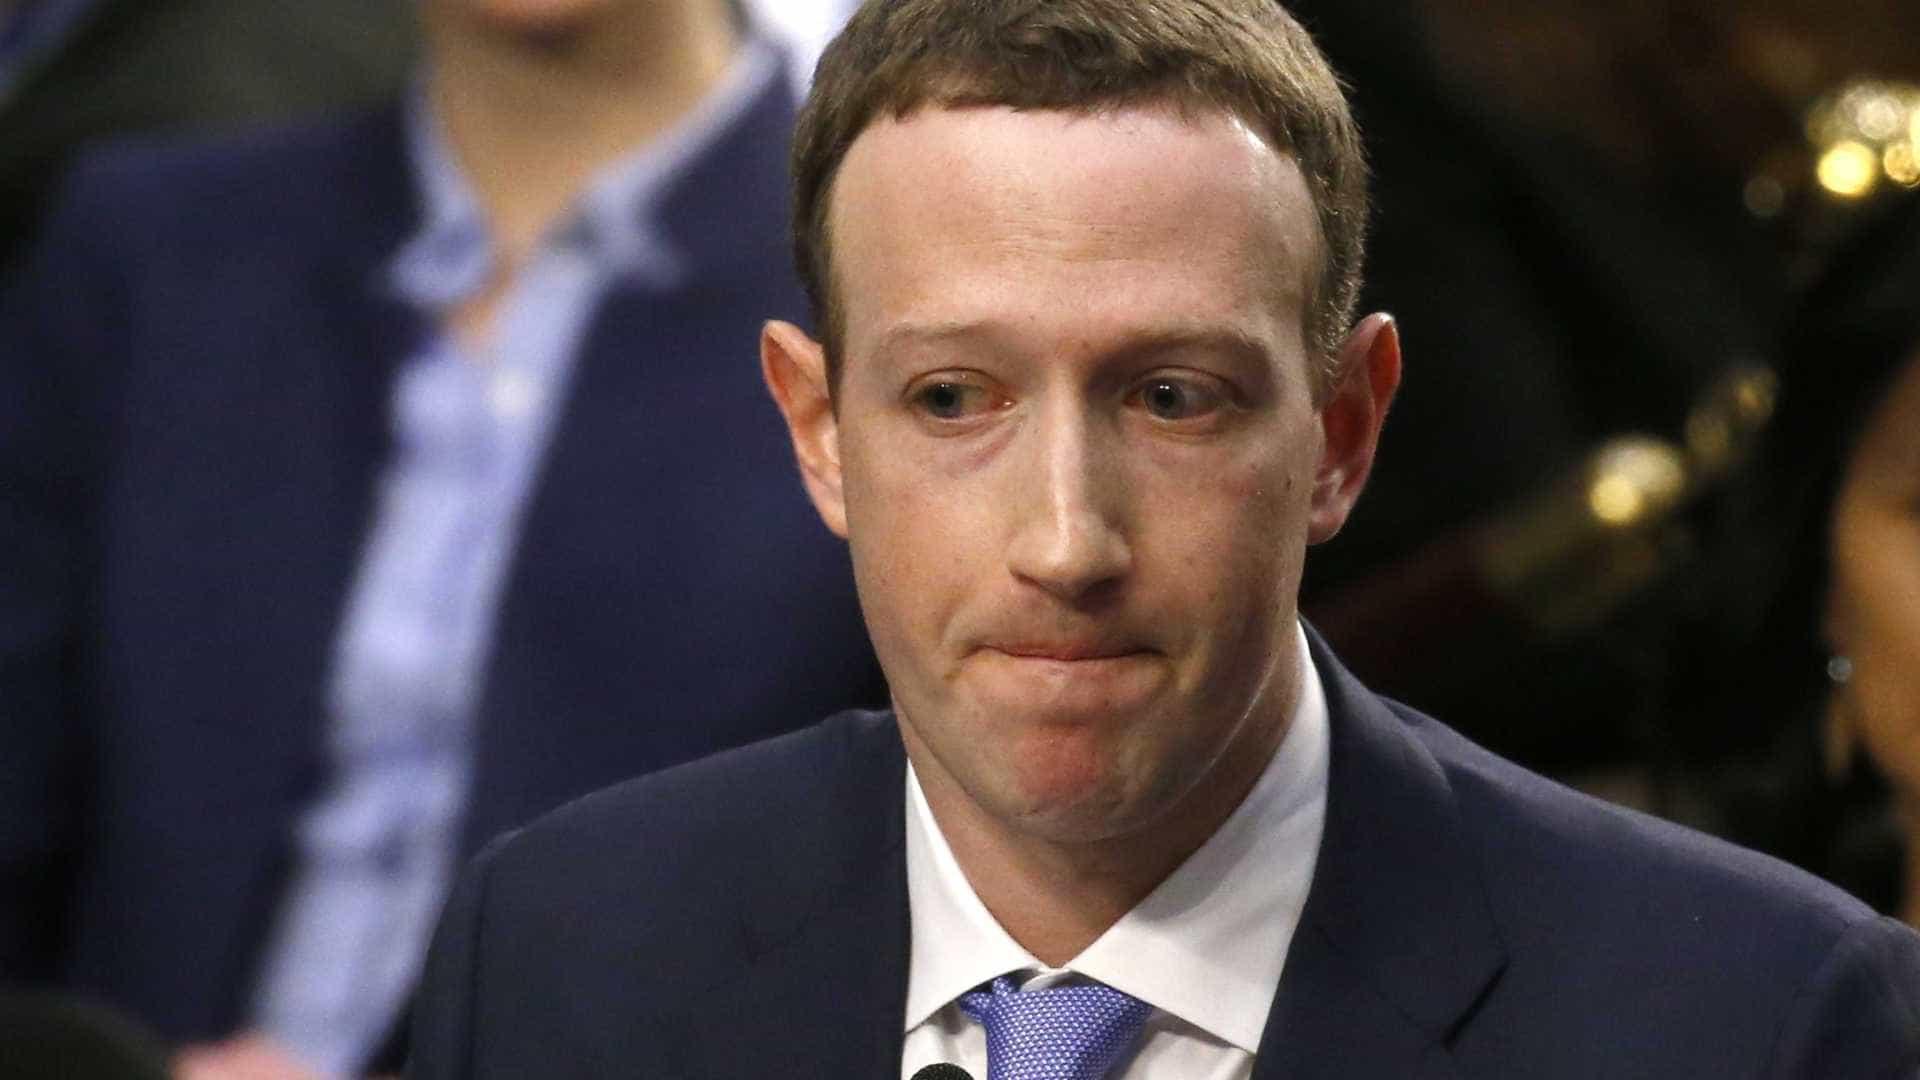 Itália multa Facebook por usar dados para fins comerciais